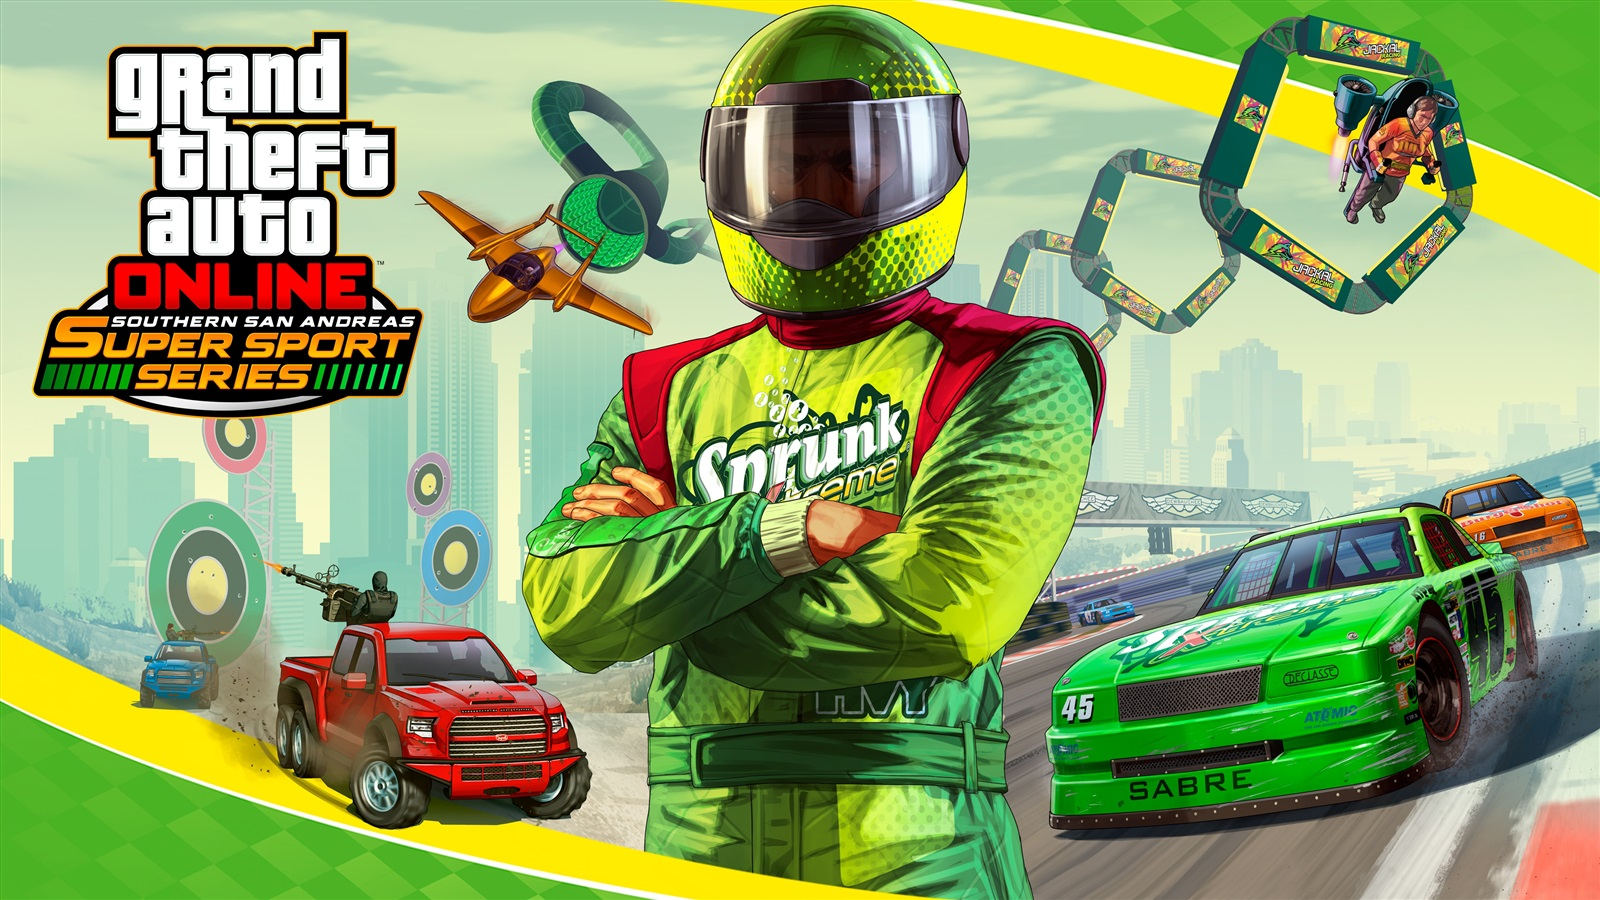 Wallpaper GTA Online Grand Theft Auto V 3840x2160 UHD 4K Picture Image